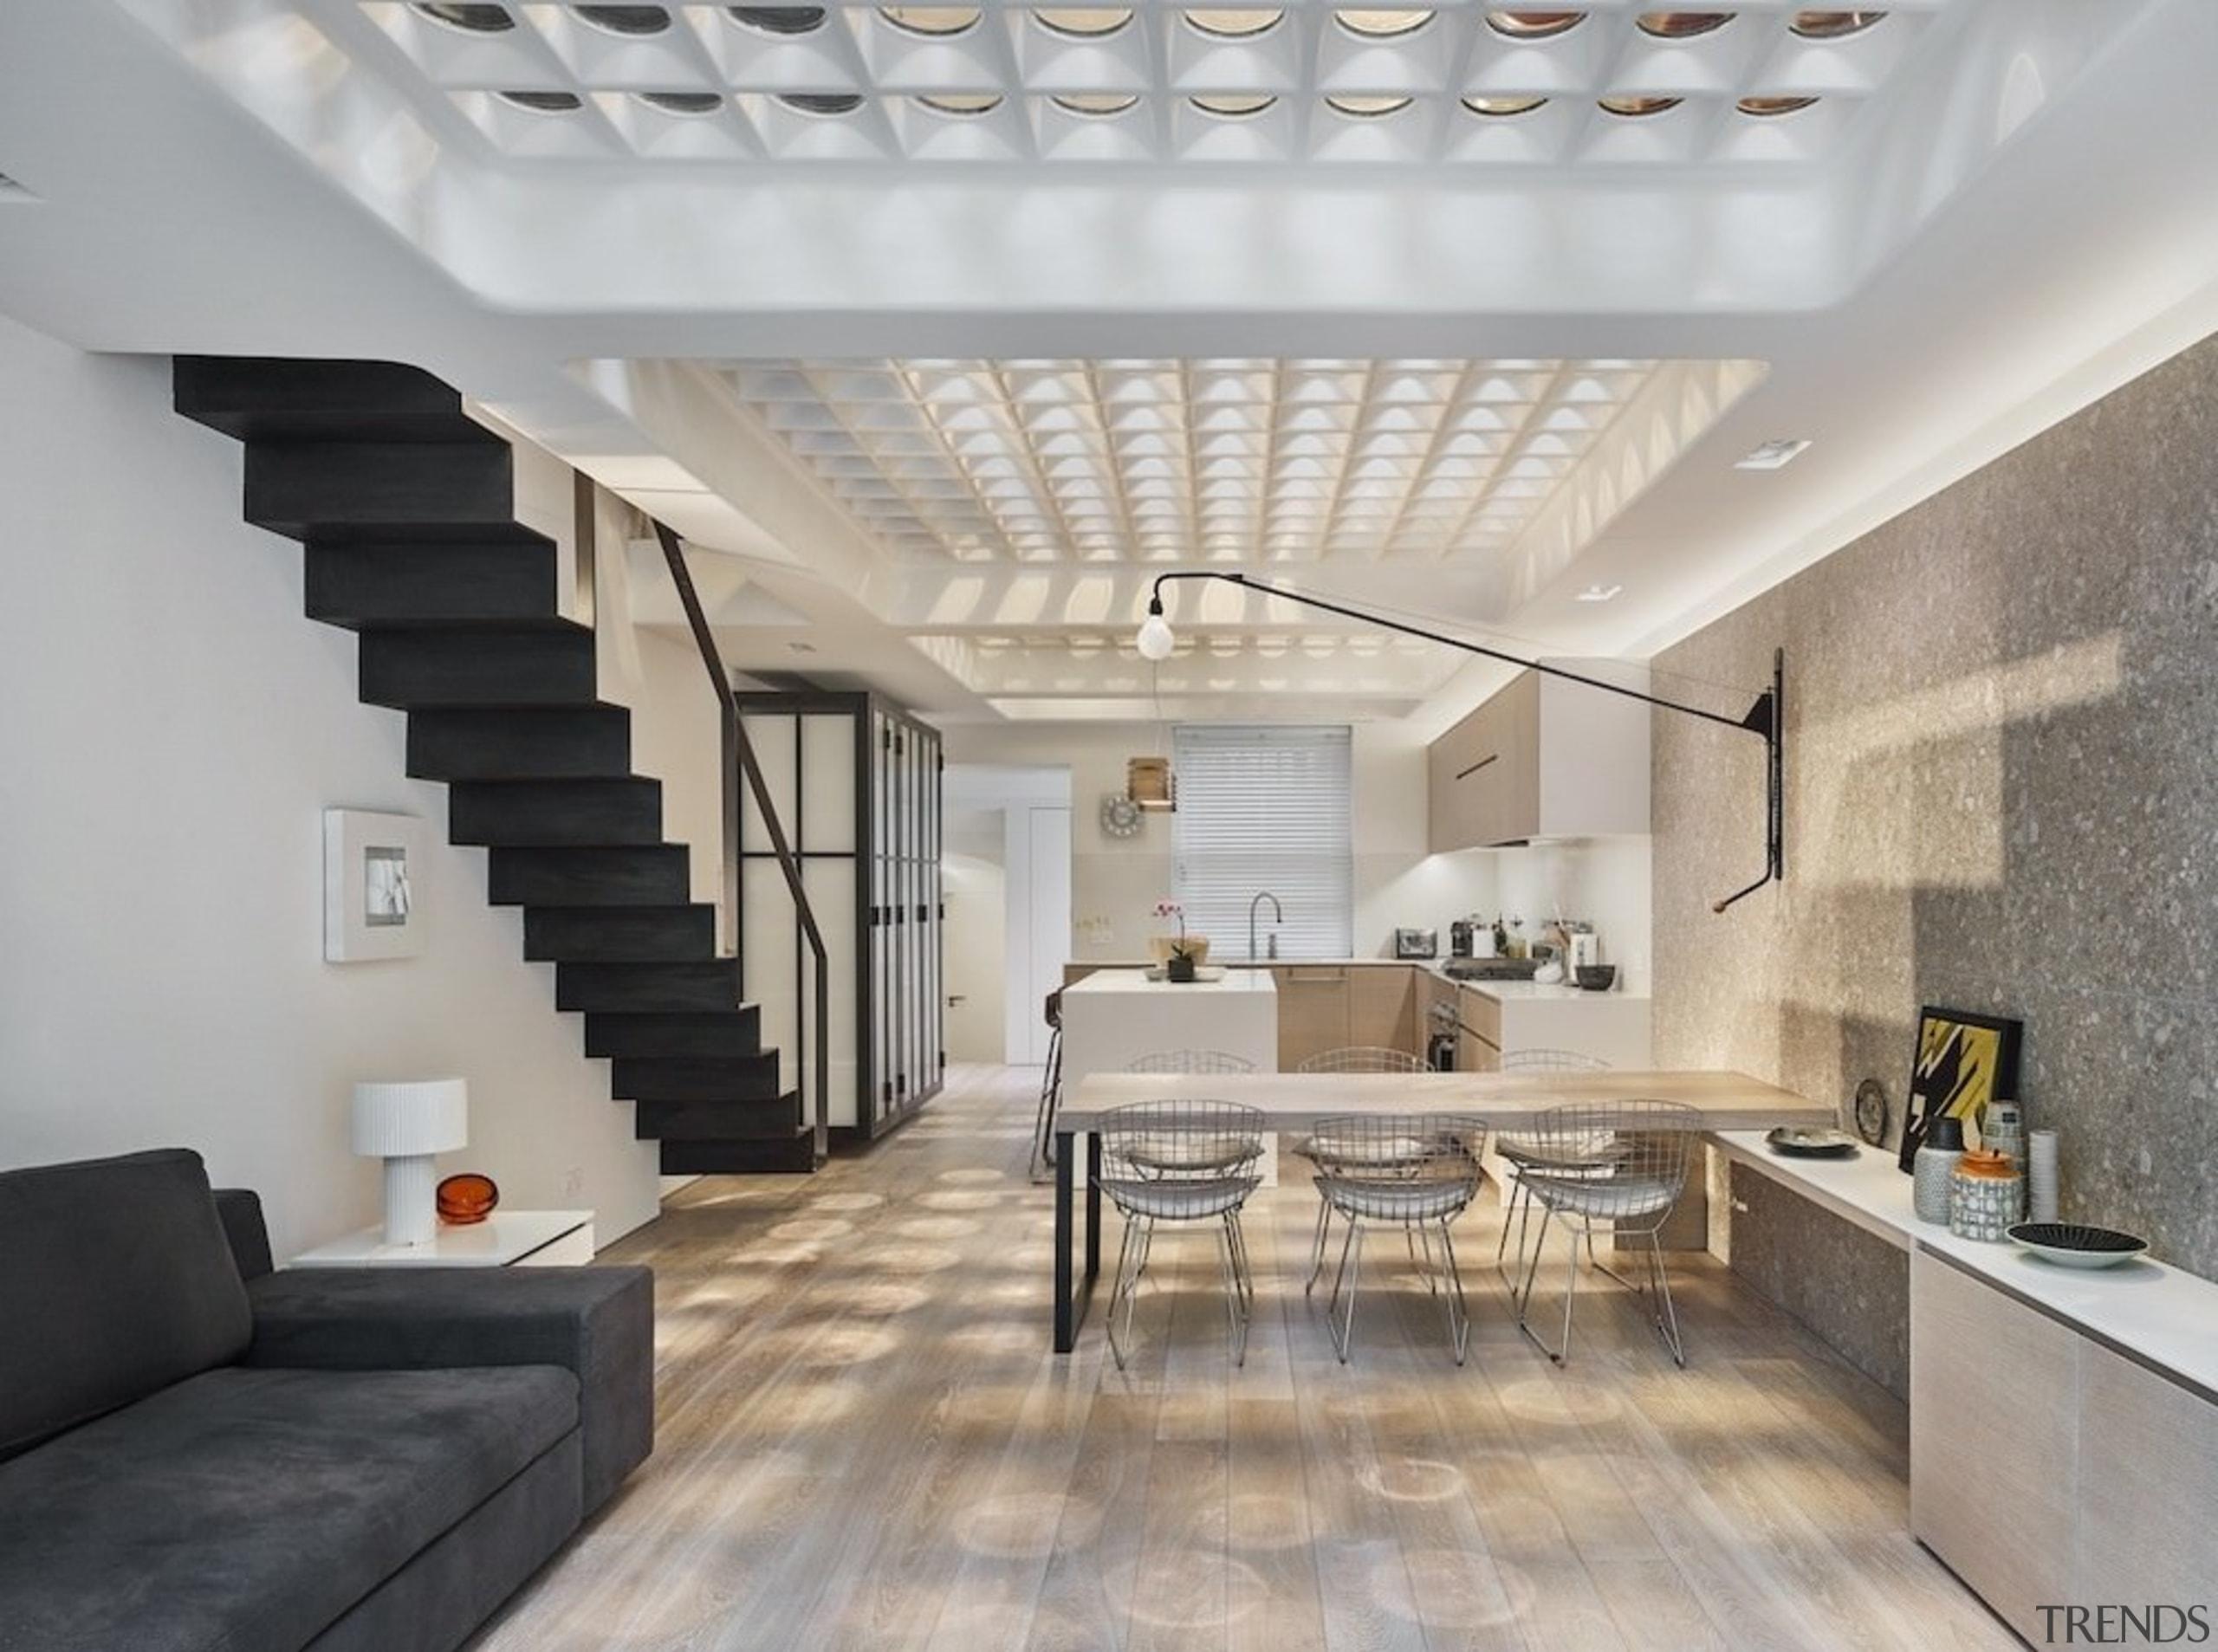 Andy Martin Architecture – Renovation in London - ceiling, daylighting, floor, interior design, interior designer, living room, loft, real estate, gray